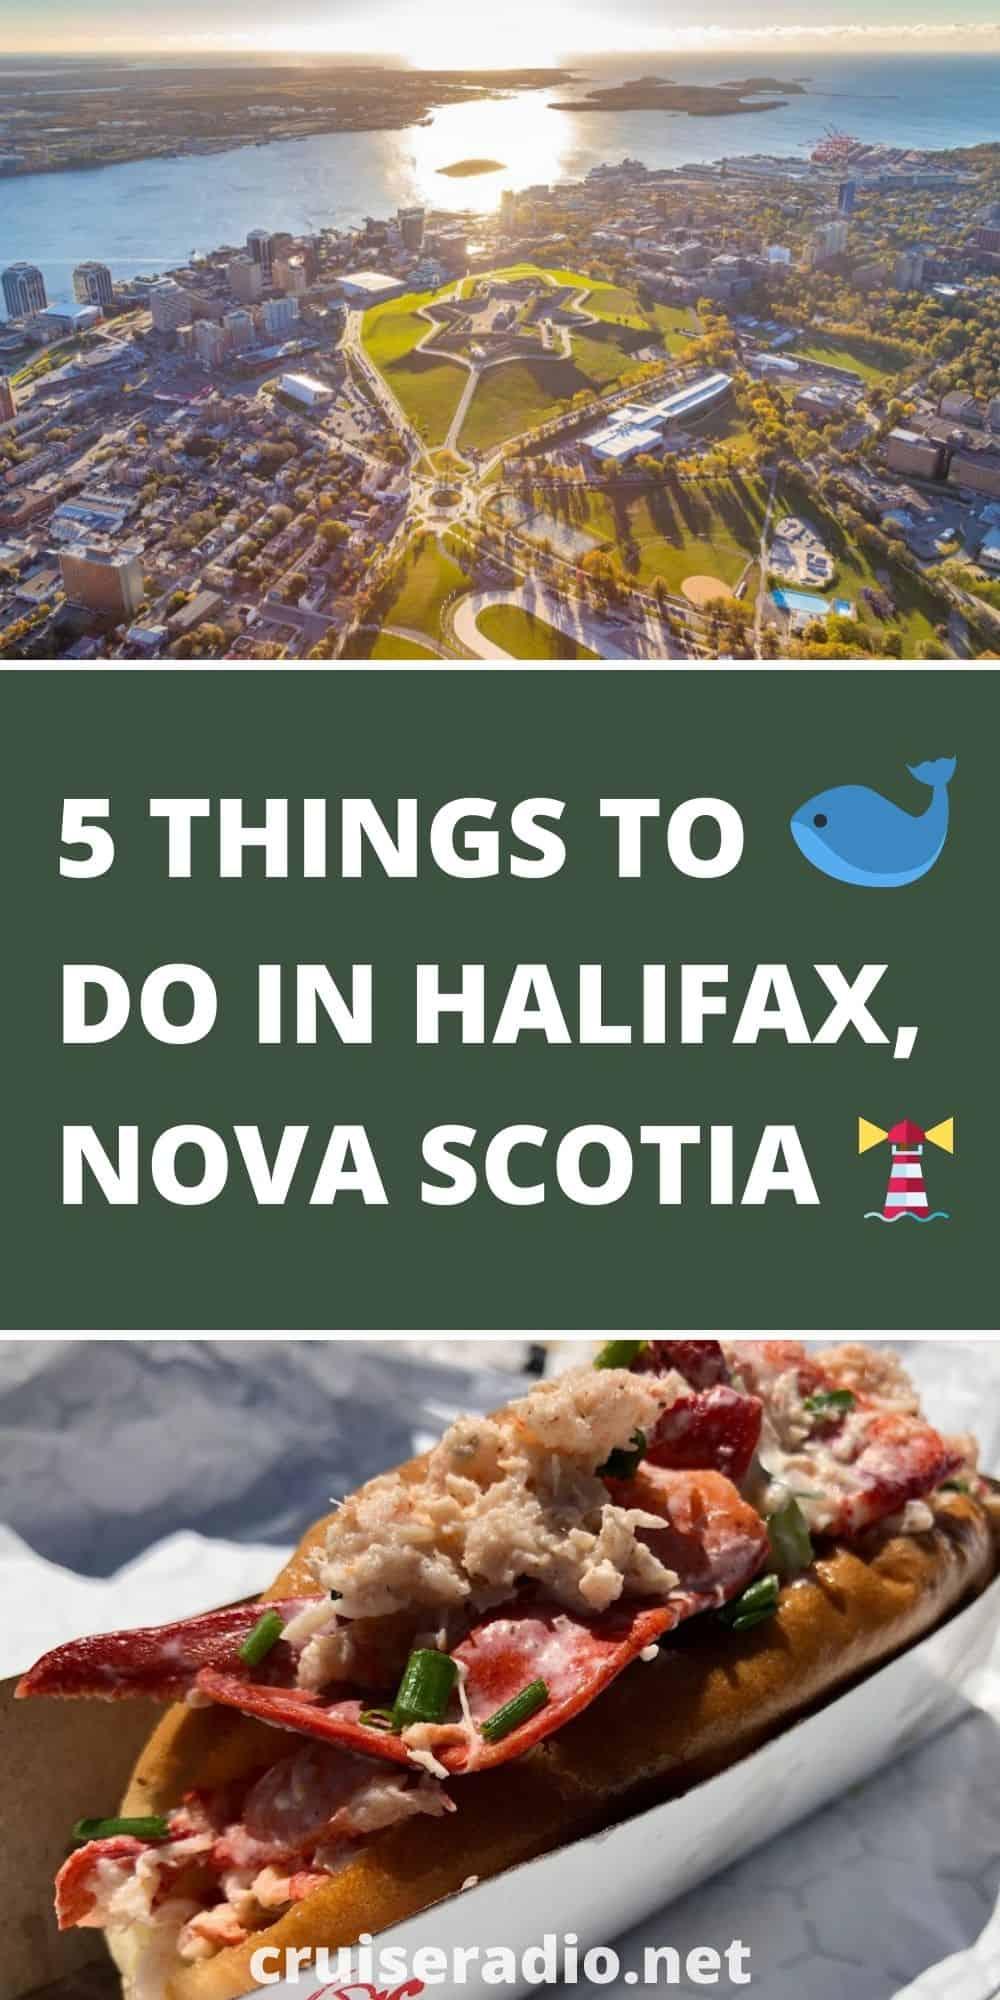 5 things to do in halifax, nova scotia pinterest image